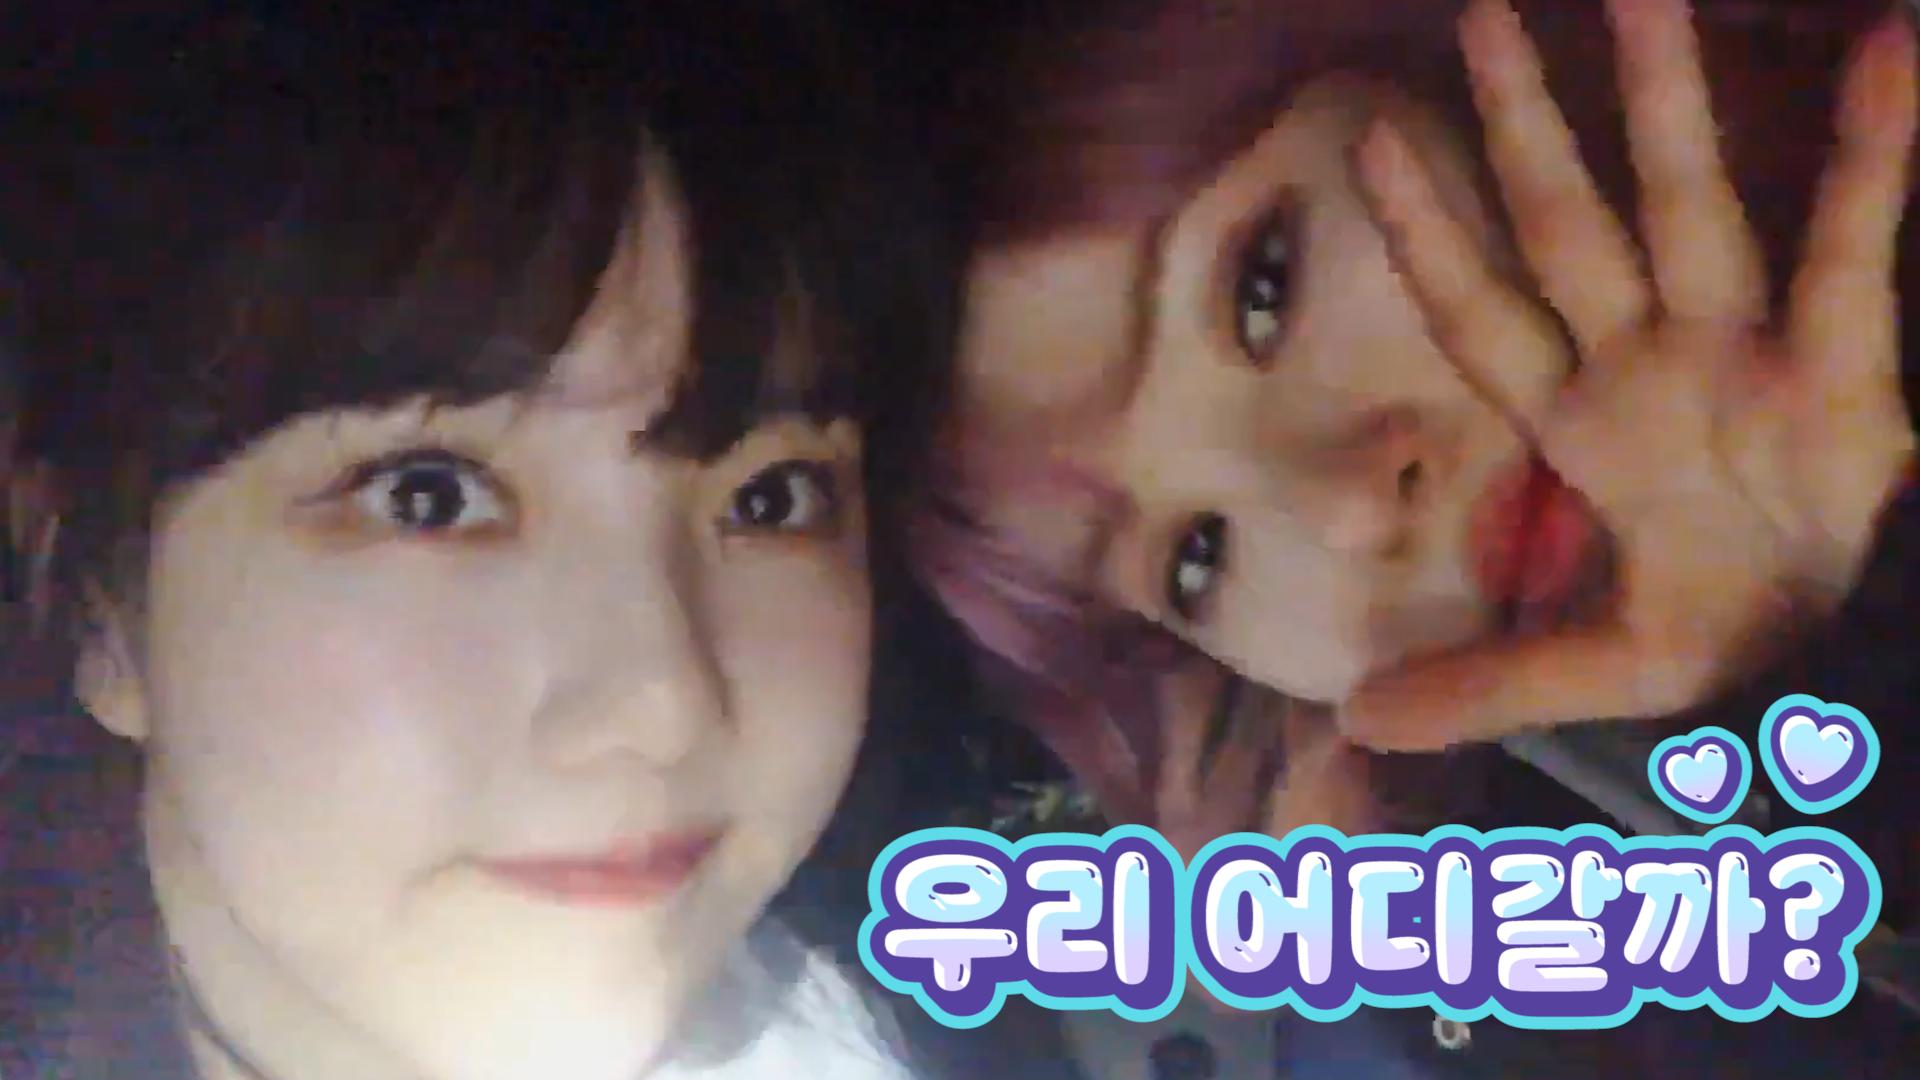 [GFRIEND] 겸둥이들 깜찍함에 지구 뚫어 내핵 산책하다 극락행 전철타기🚃💖 (Eunha&Yerin talking about their recent episode)